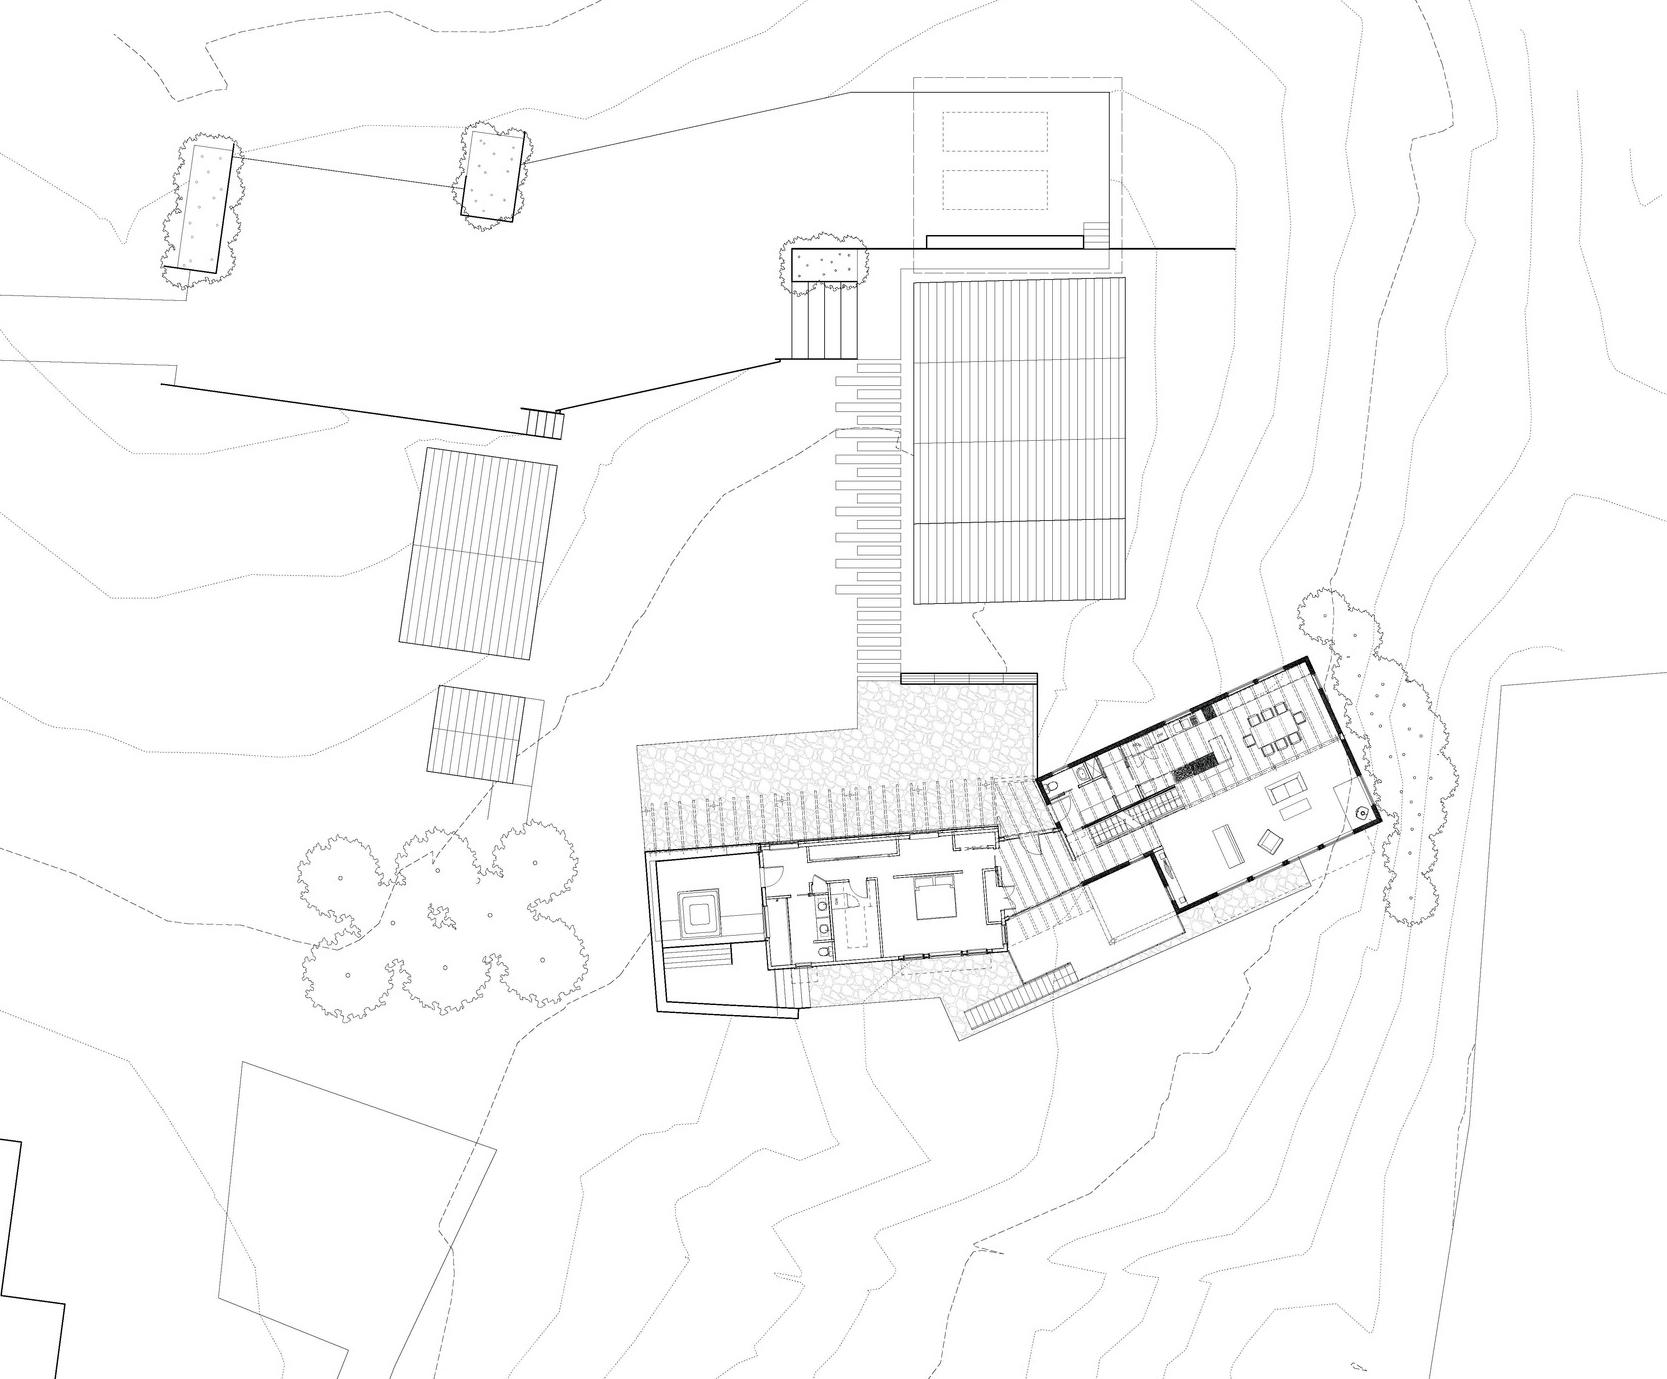 BEYOND-Site Plan-14-1216.jpg